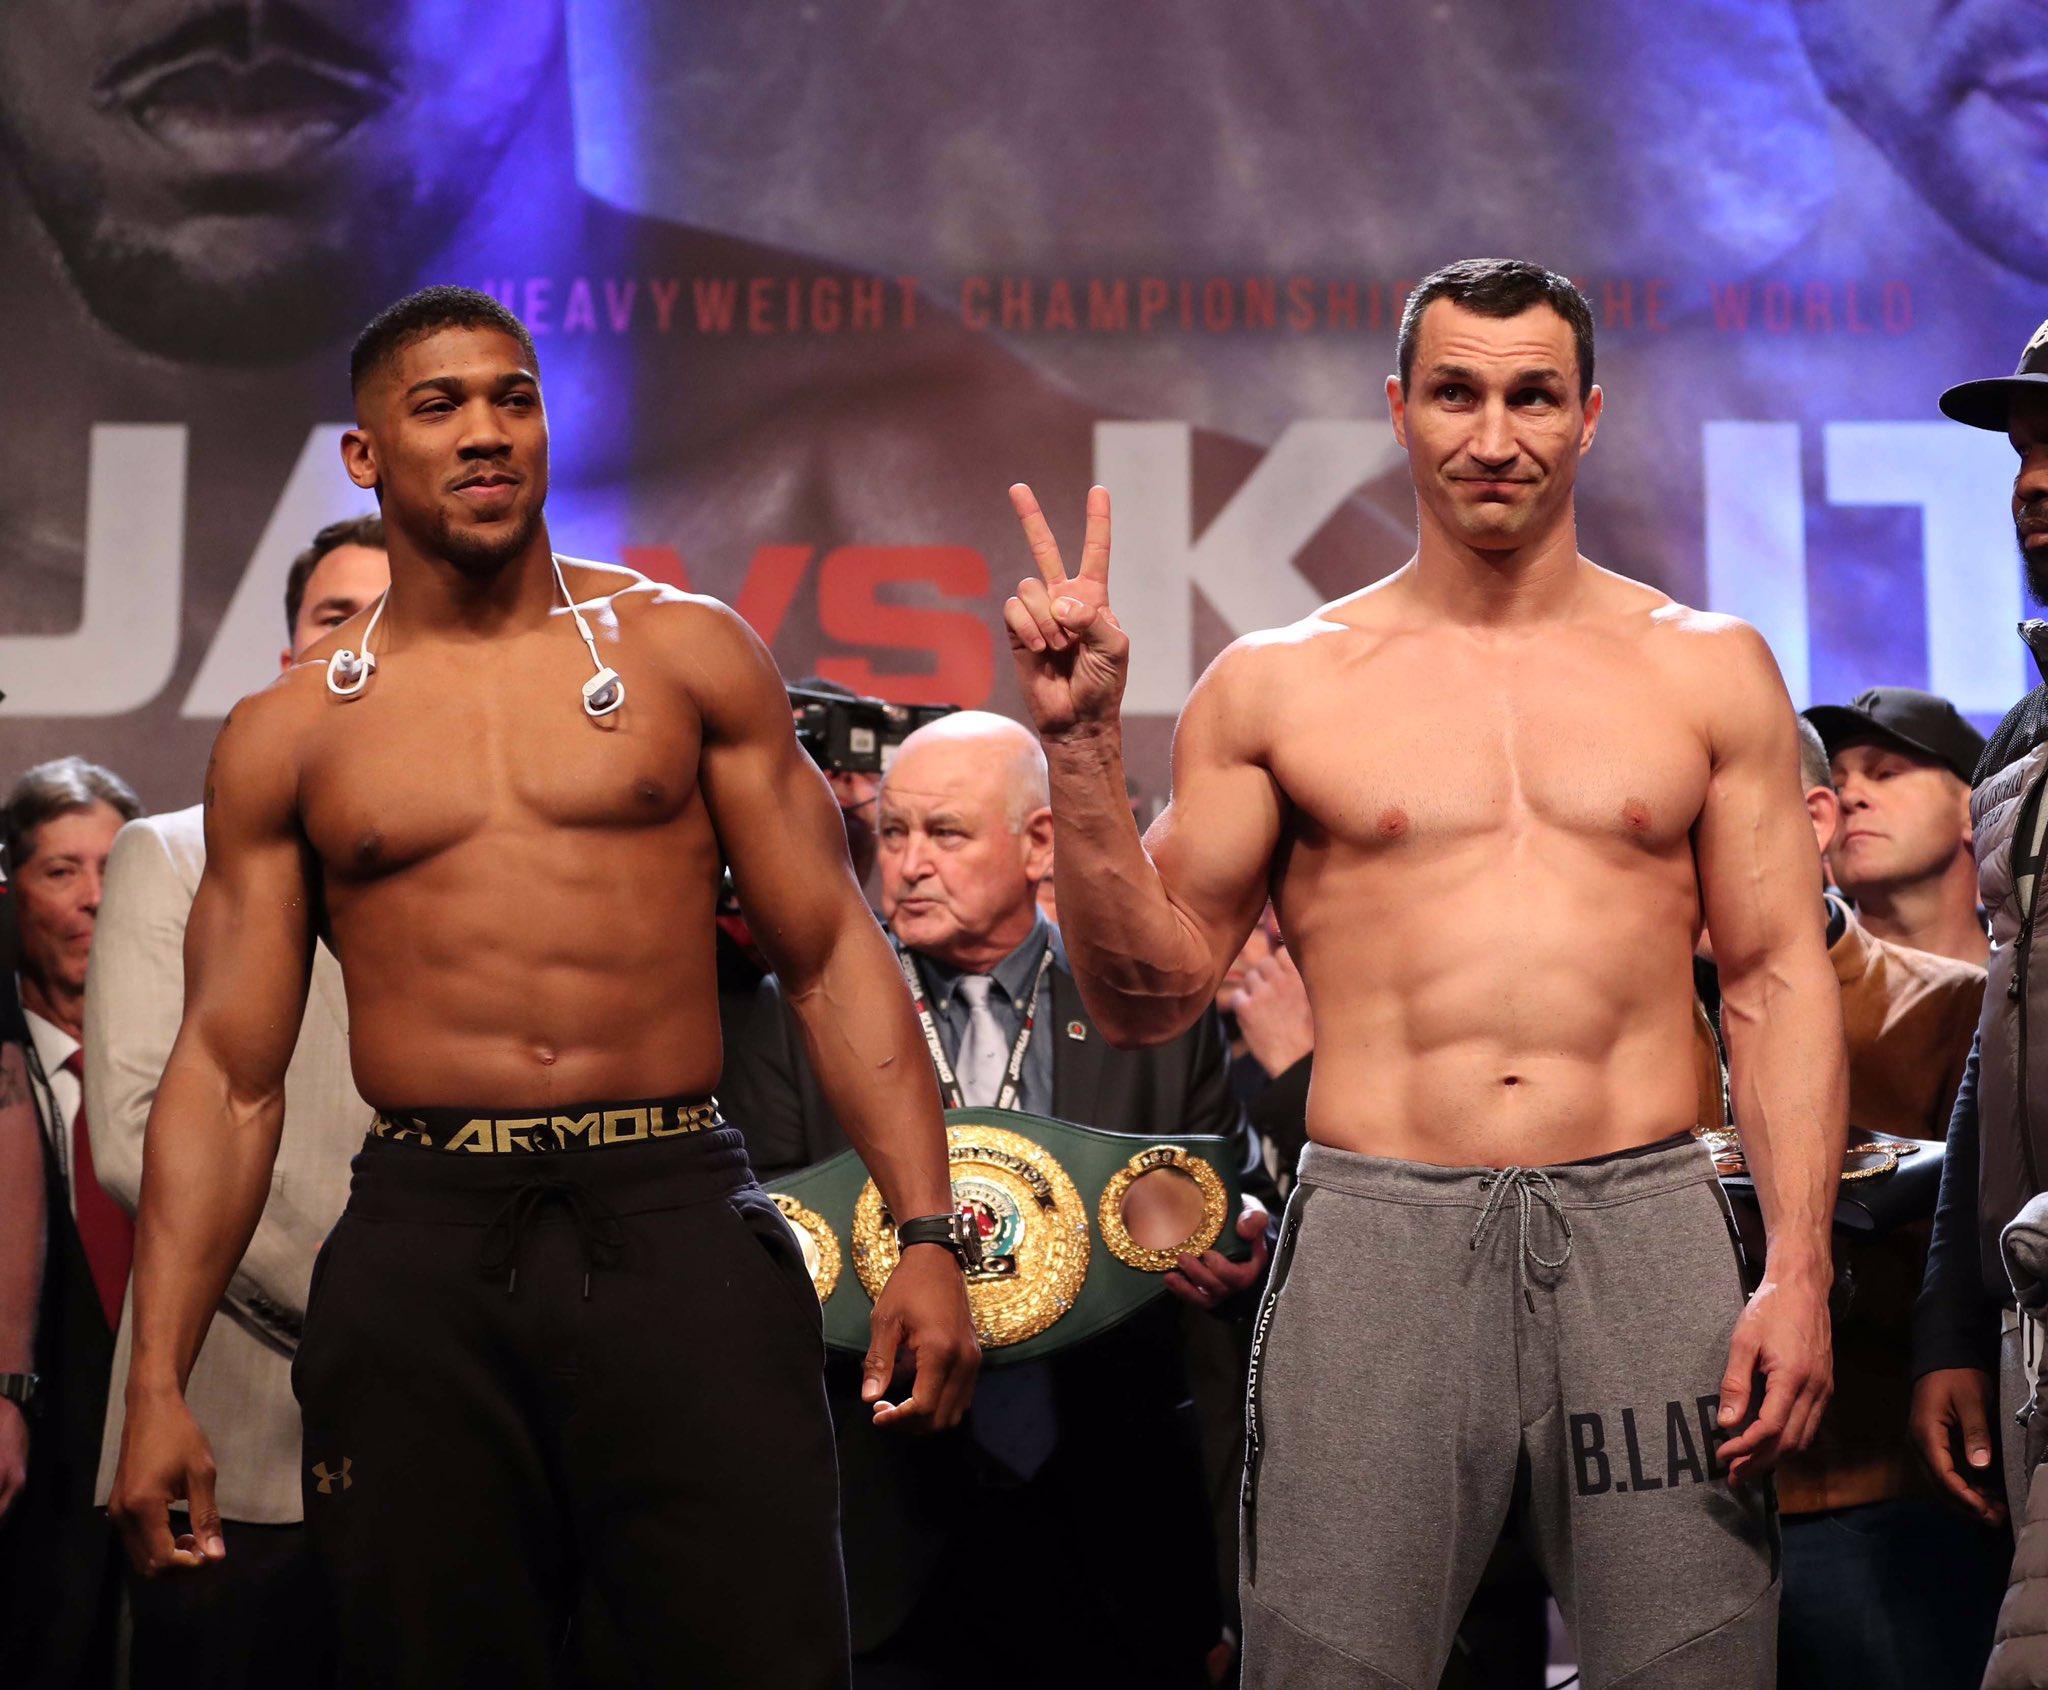 Moweta: Joshua Vs Klitschko Worth $40m, But Not A Big Fight In USA